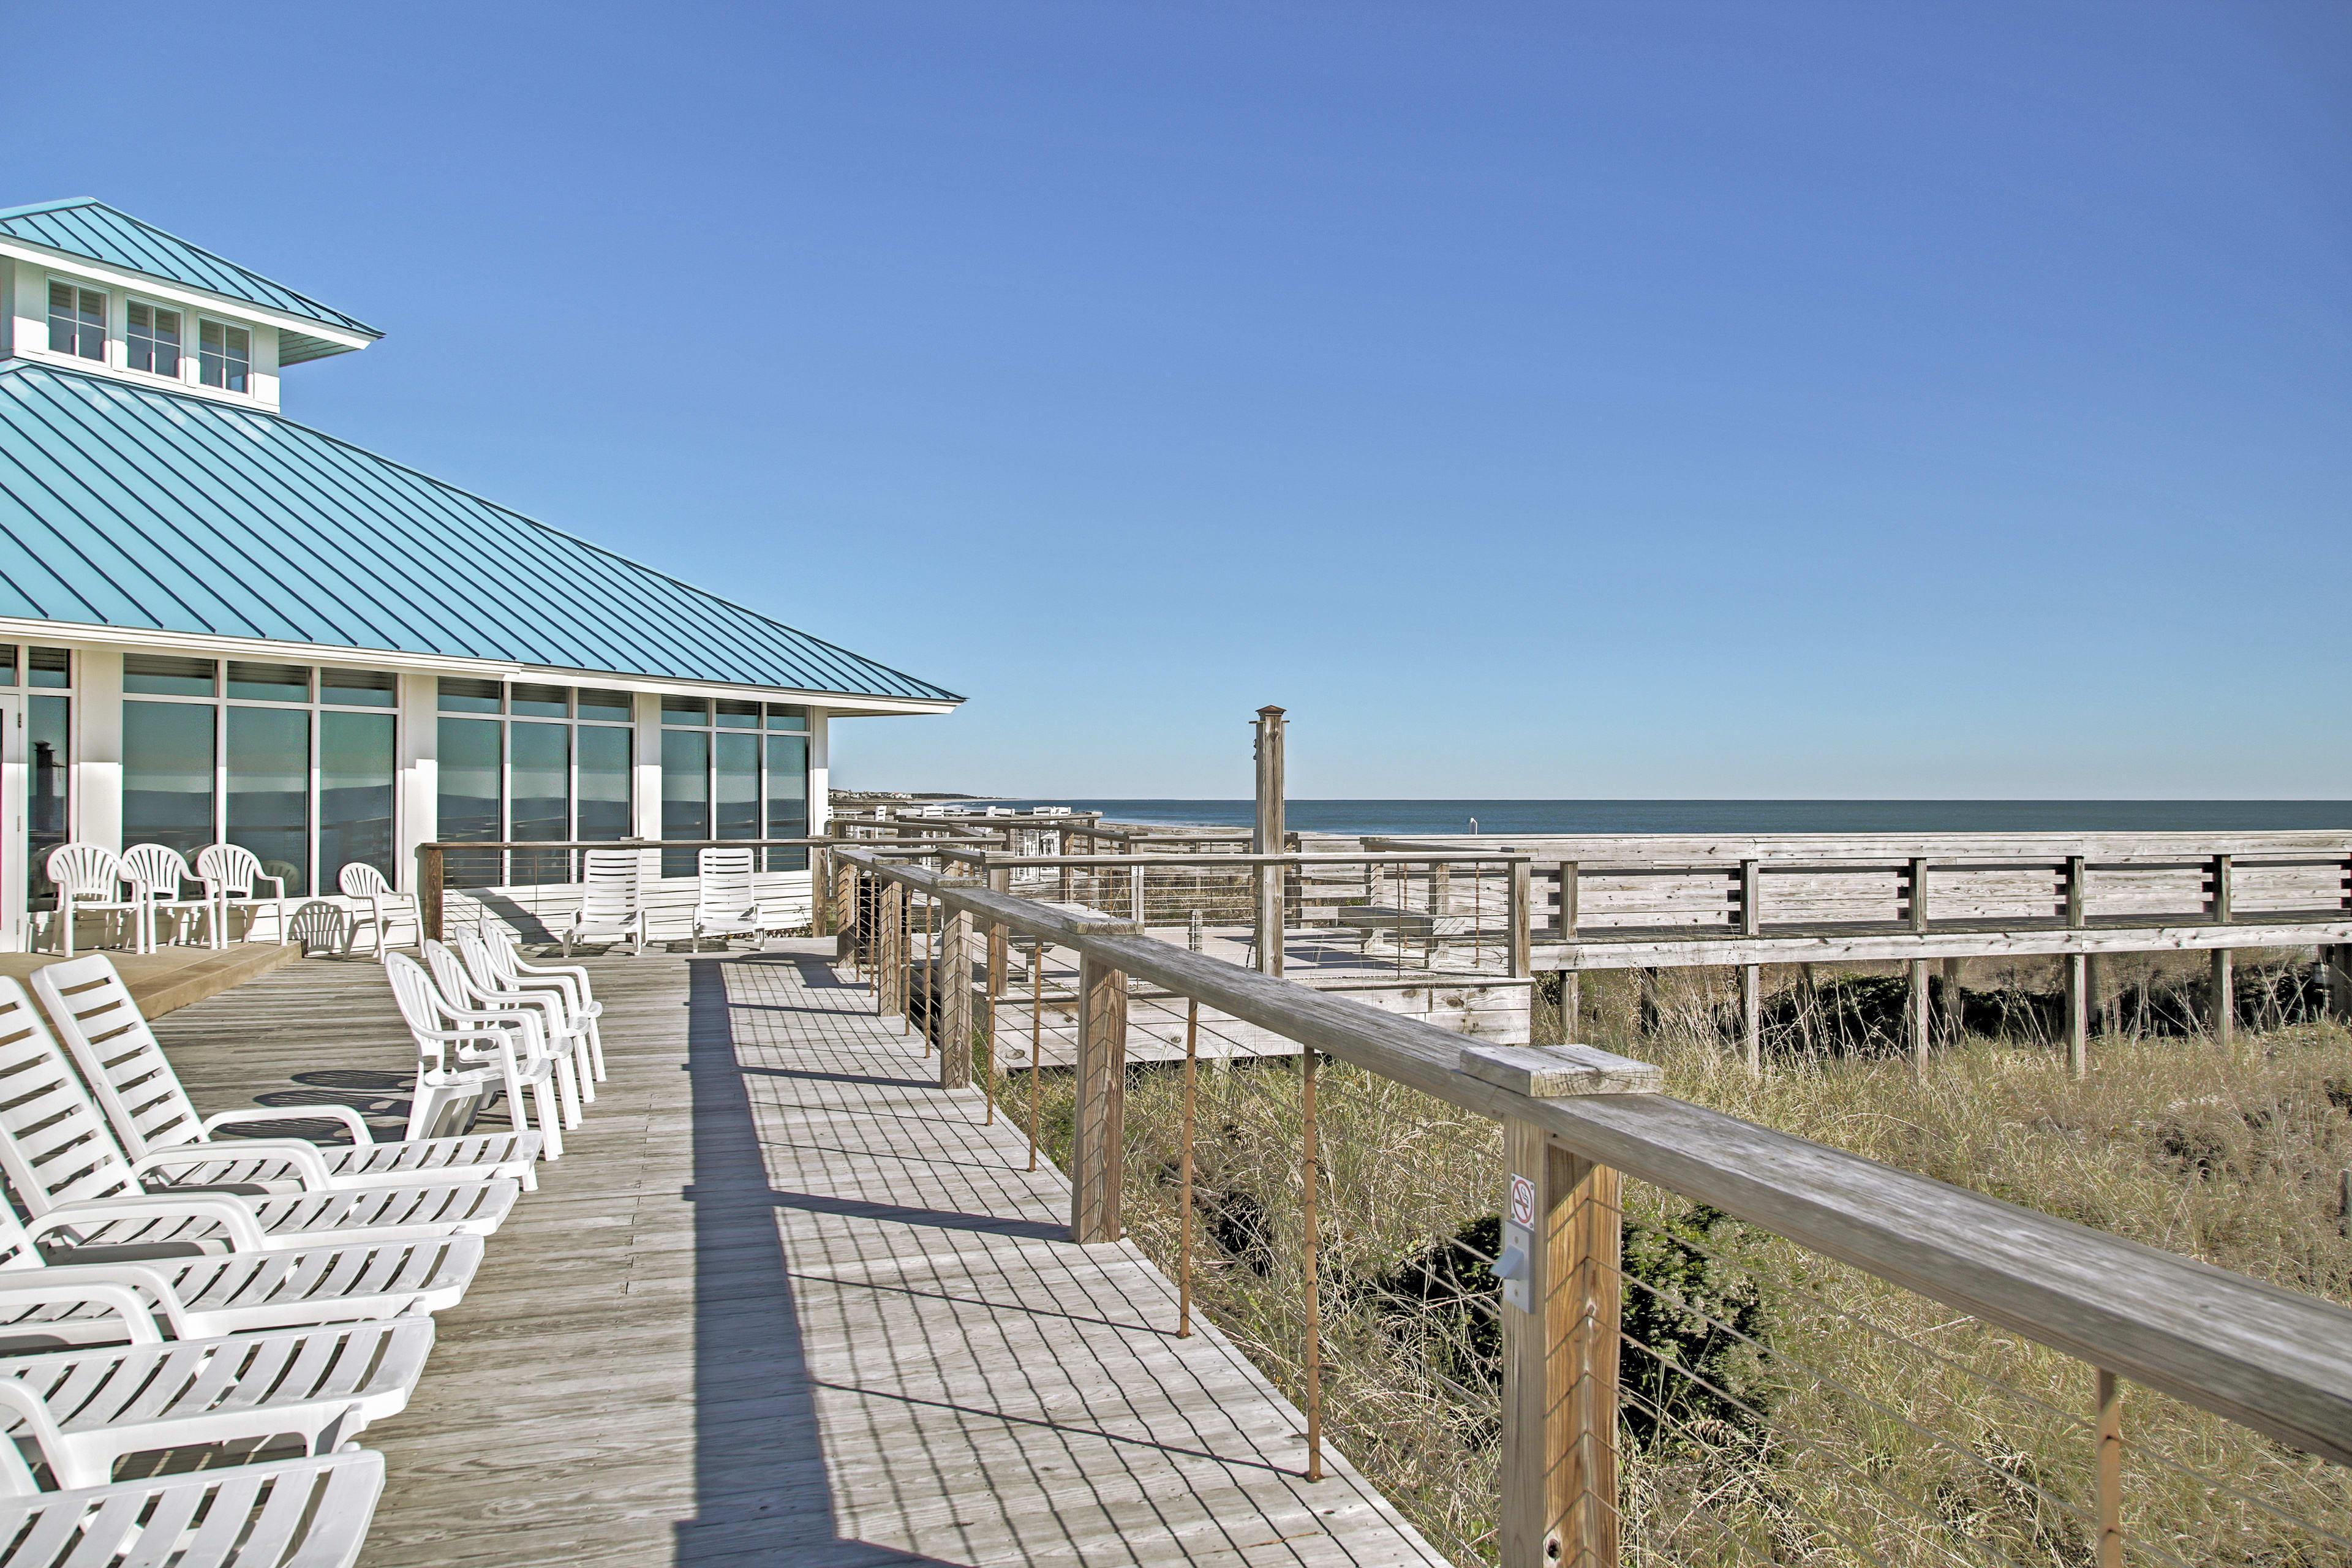 Walk along the boardwalk and lounge in the sun.